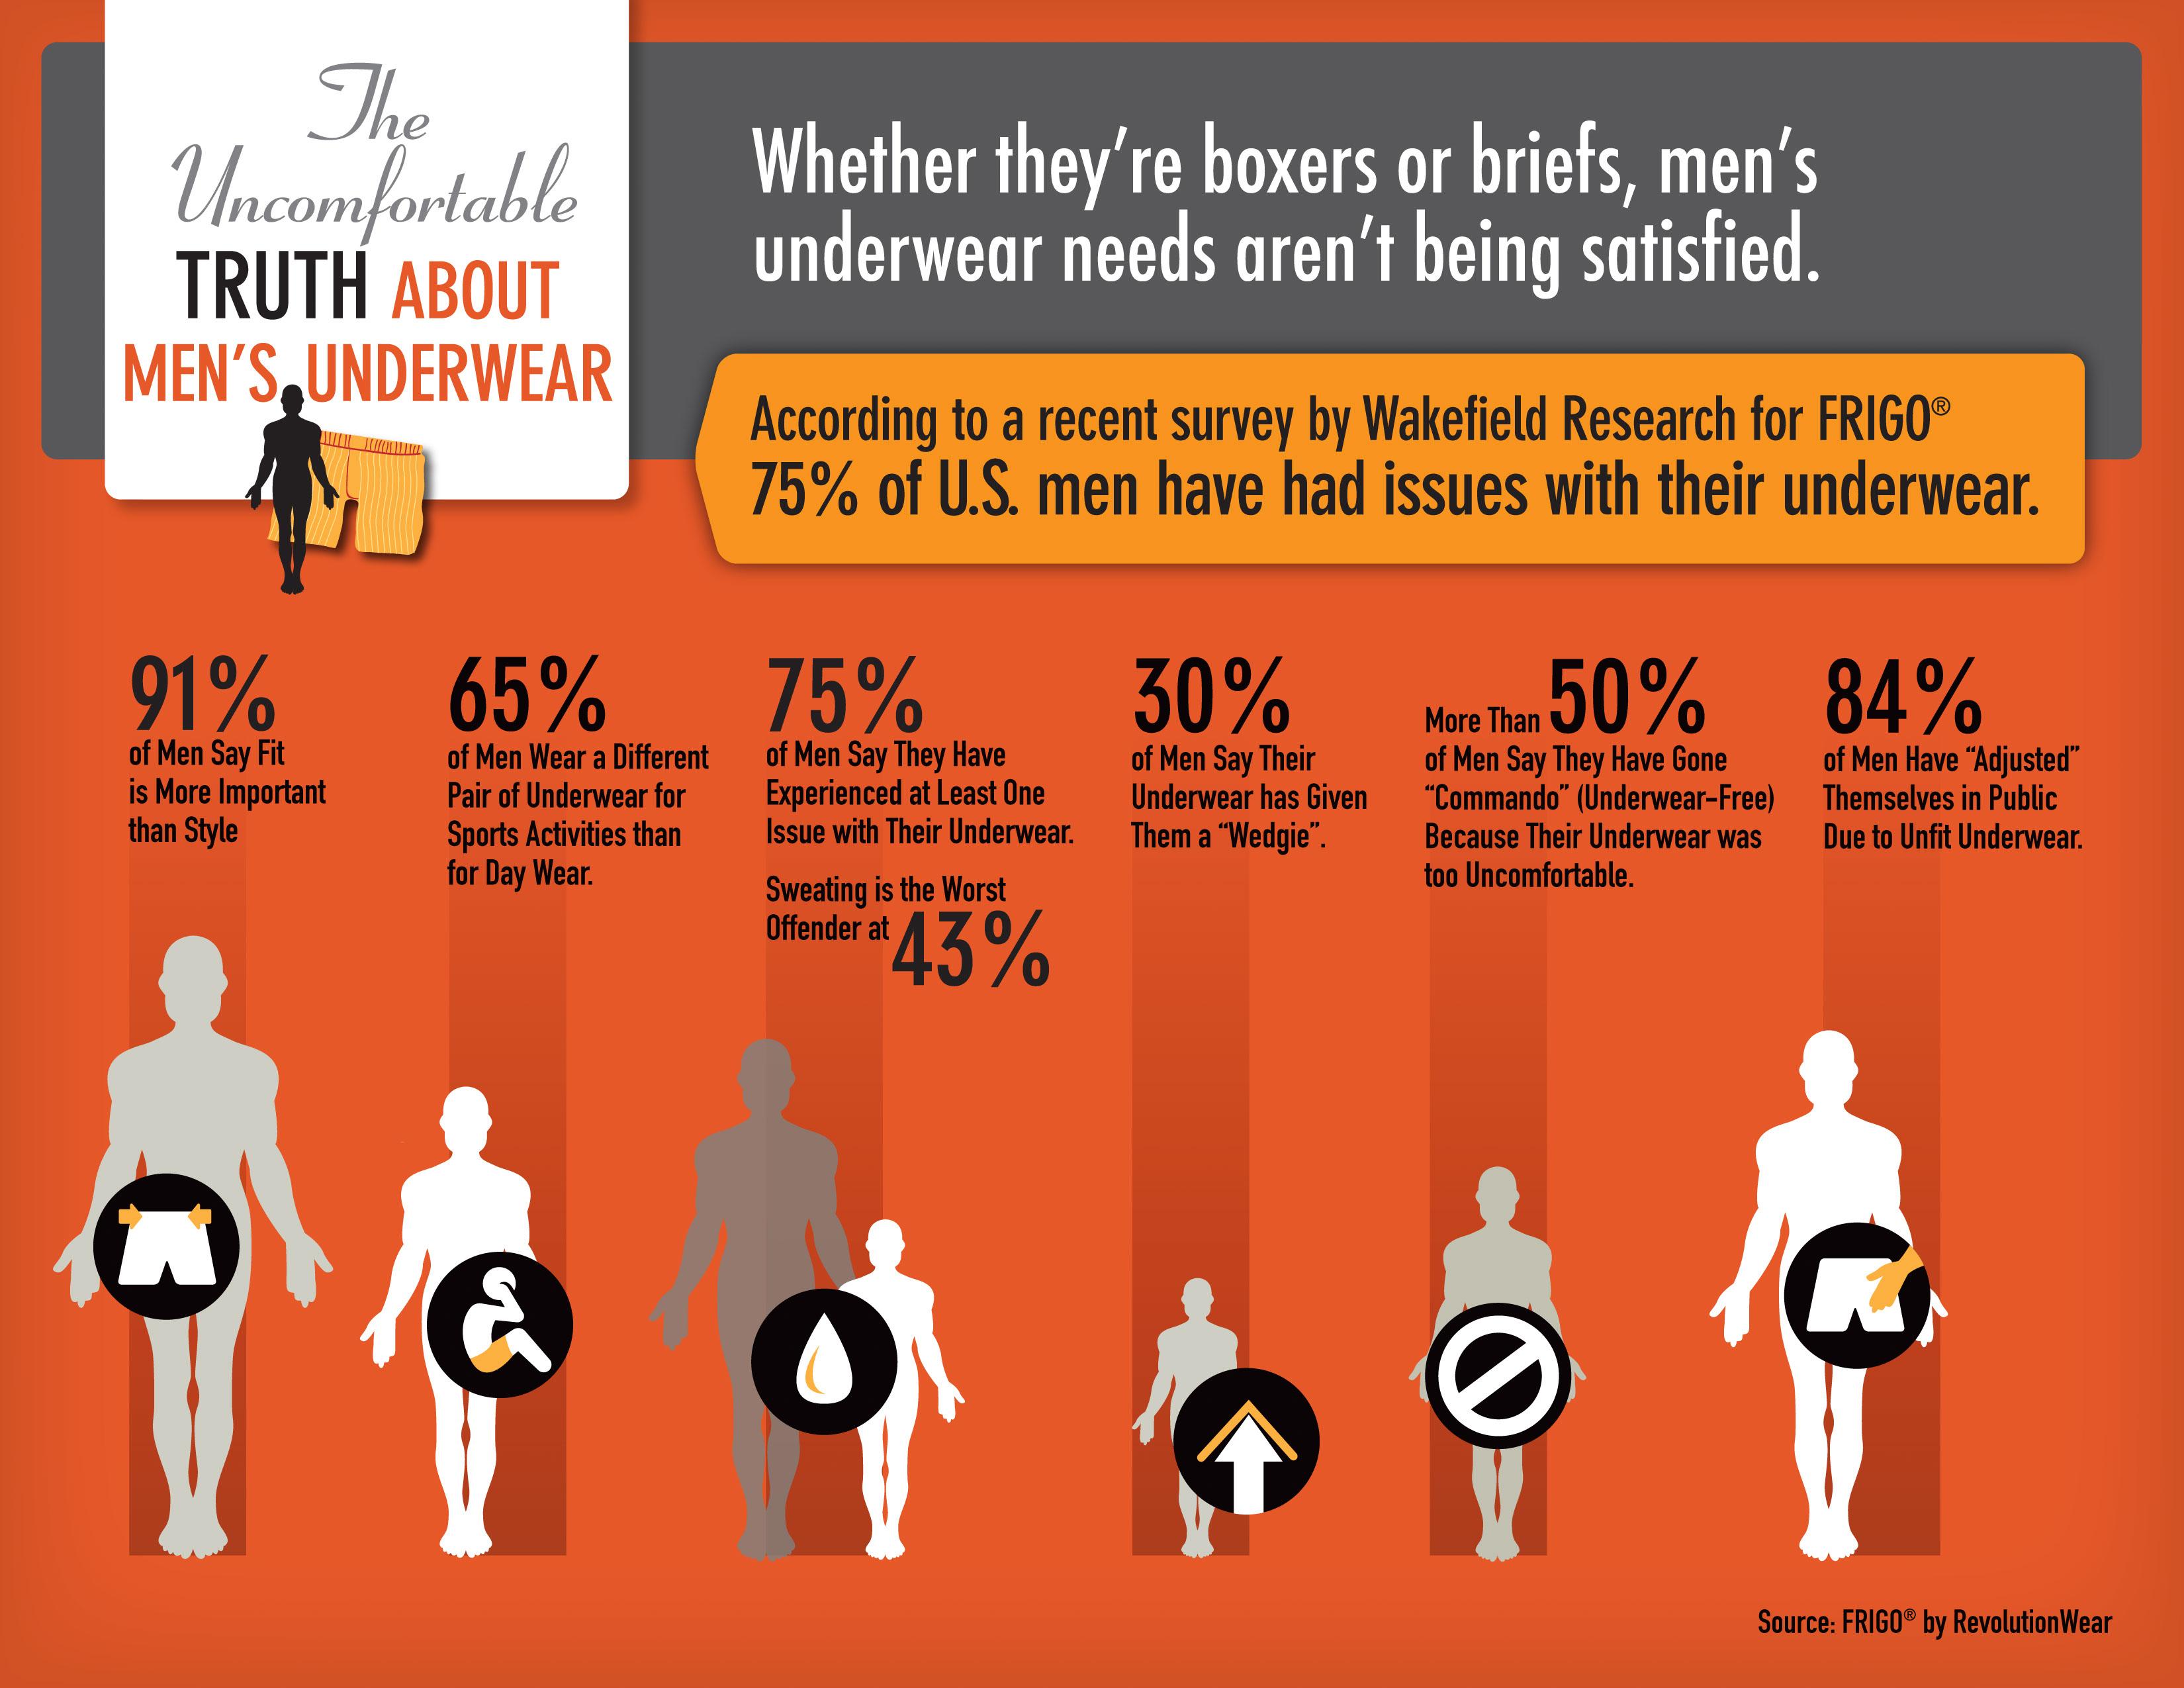 Truth-About-Men's-Underwear-infographic